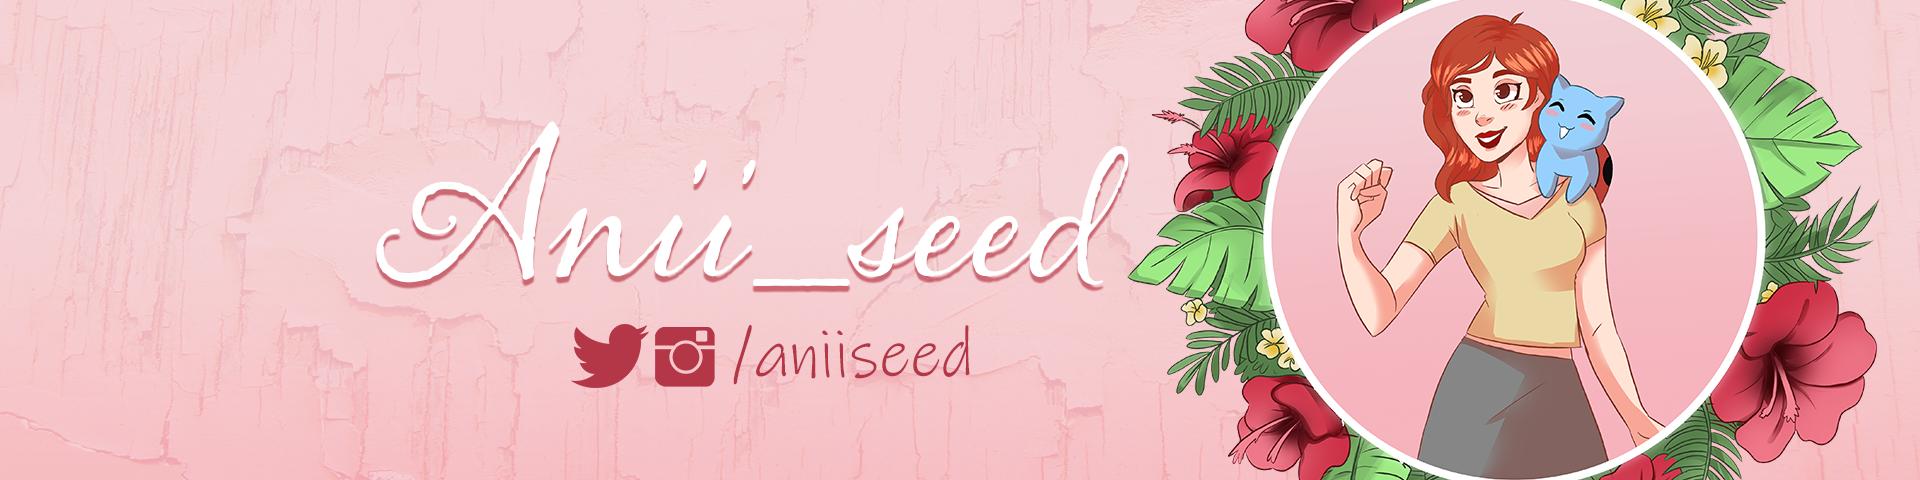 Anii_seed